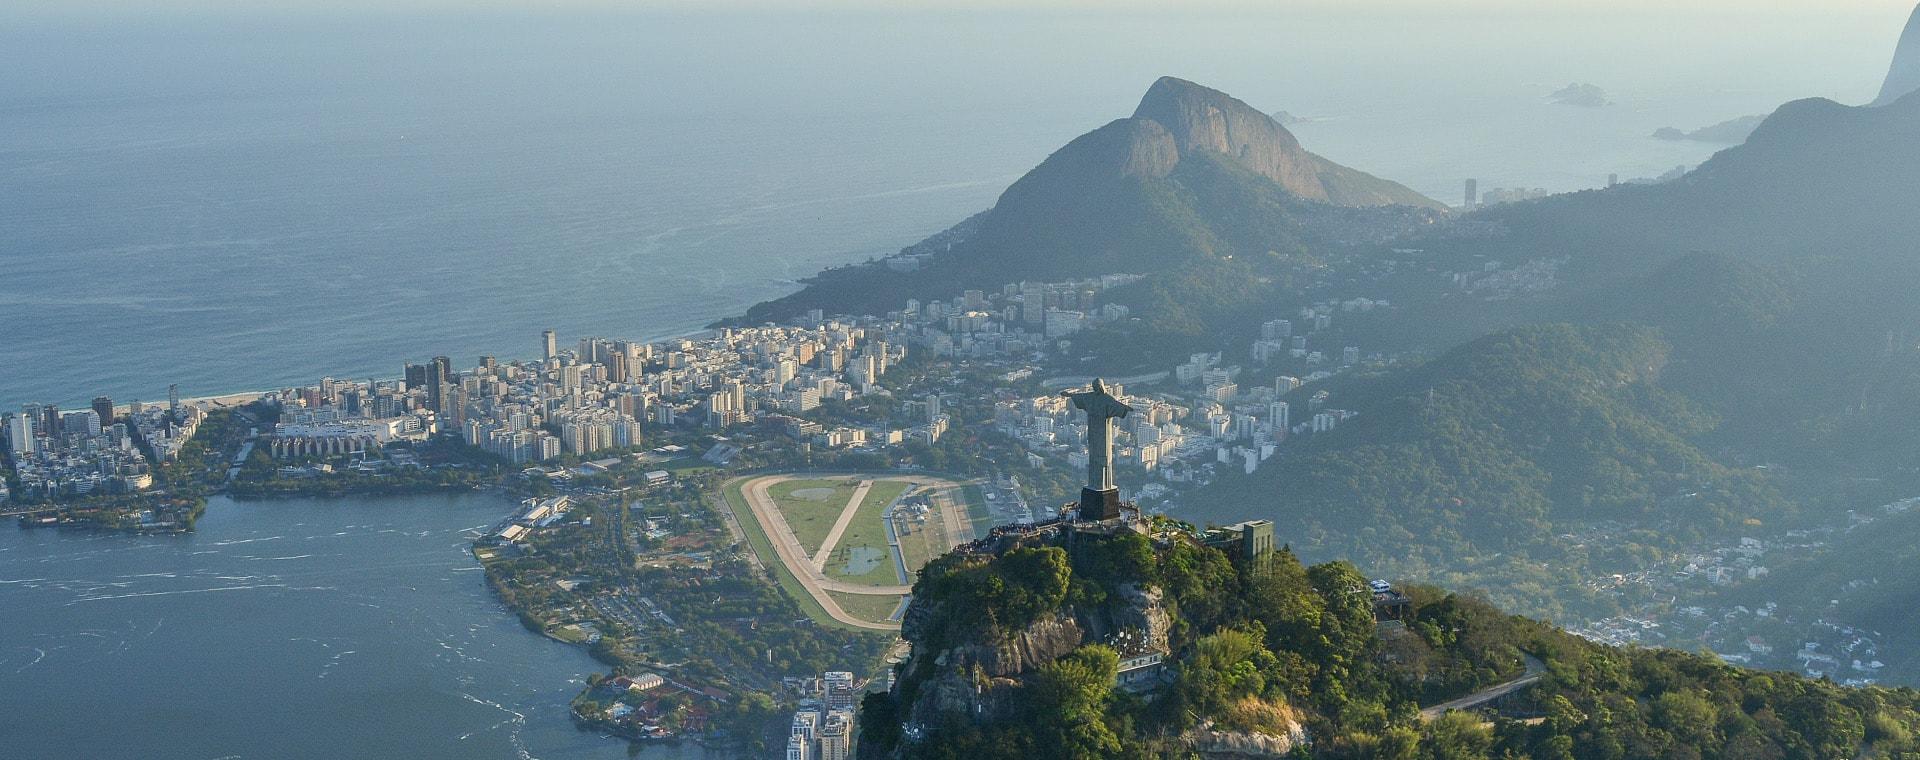 Brazil risks illustration